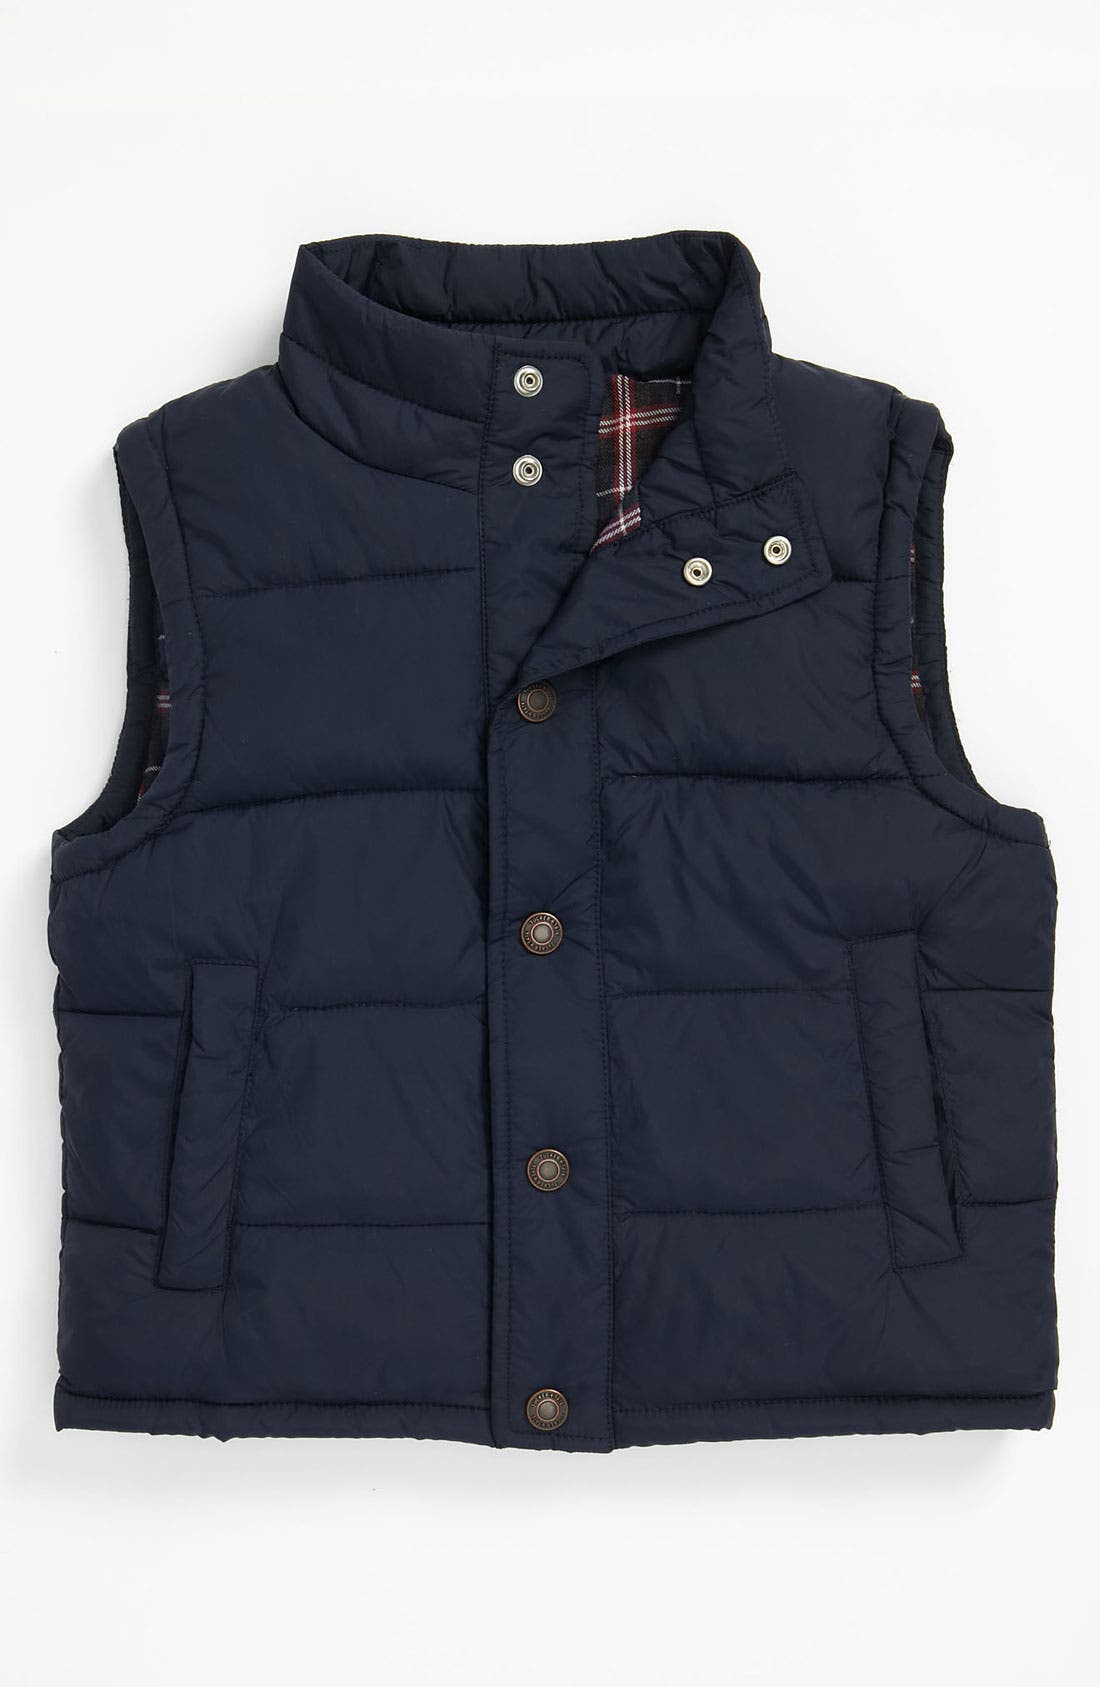 Alternate Image 1 Selected - Tucker + Tate Field Vest (Infant)